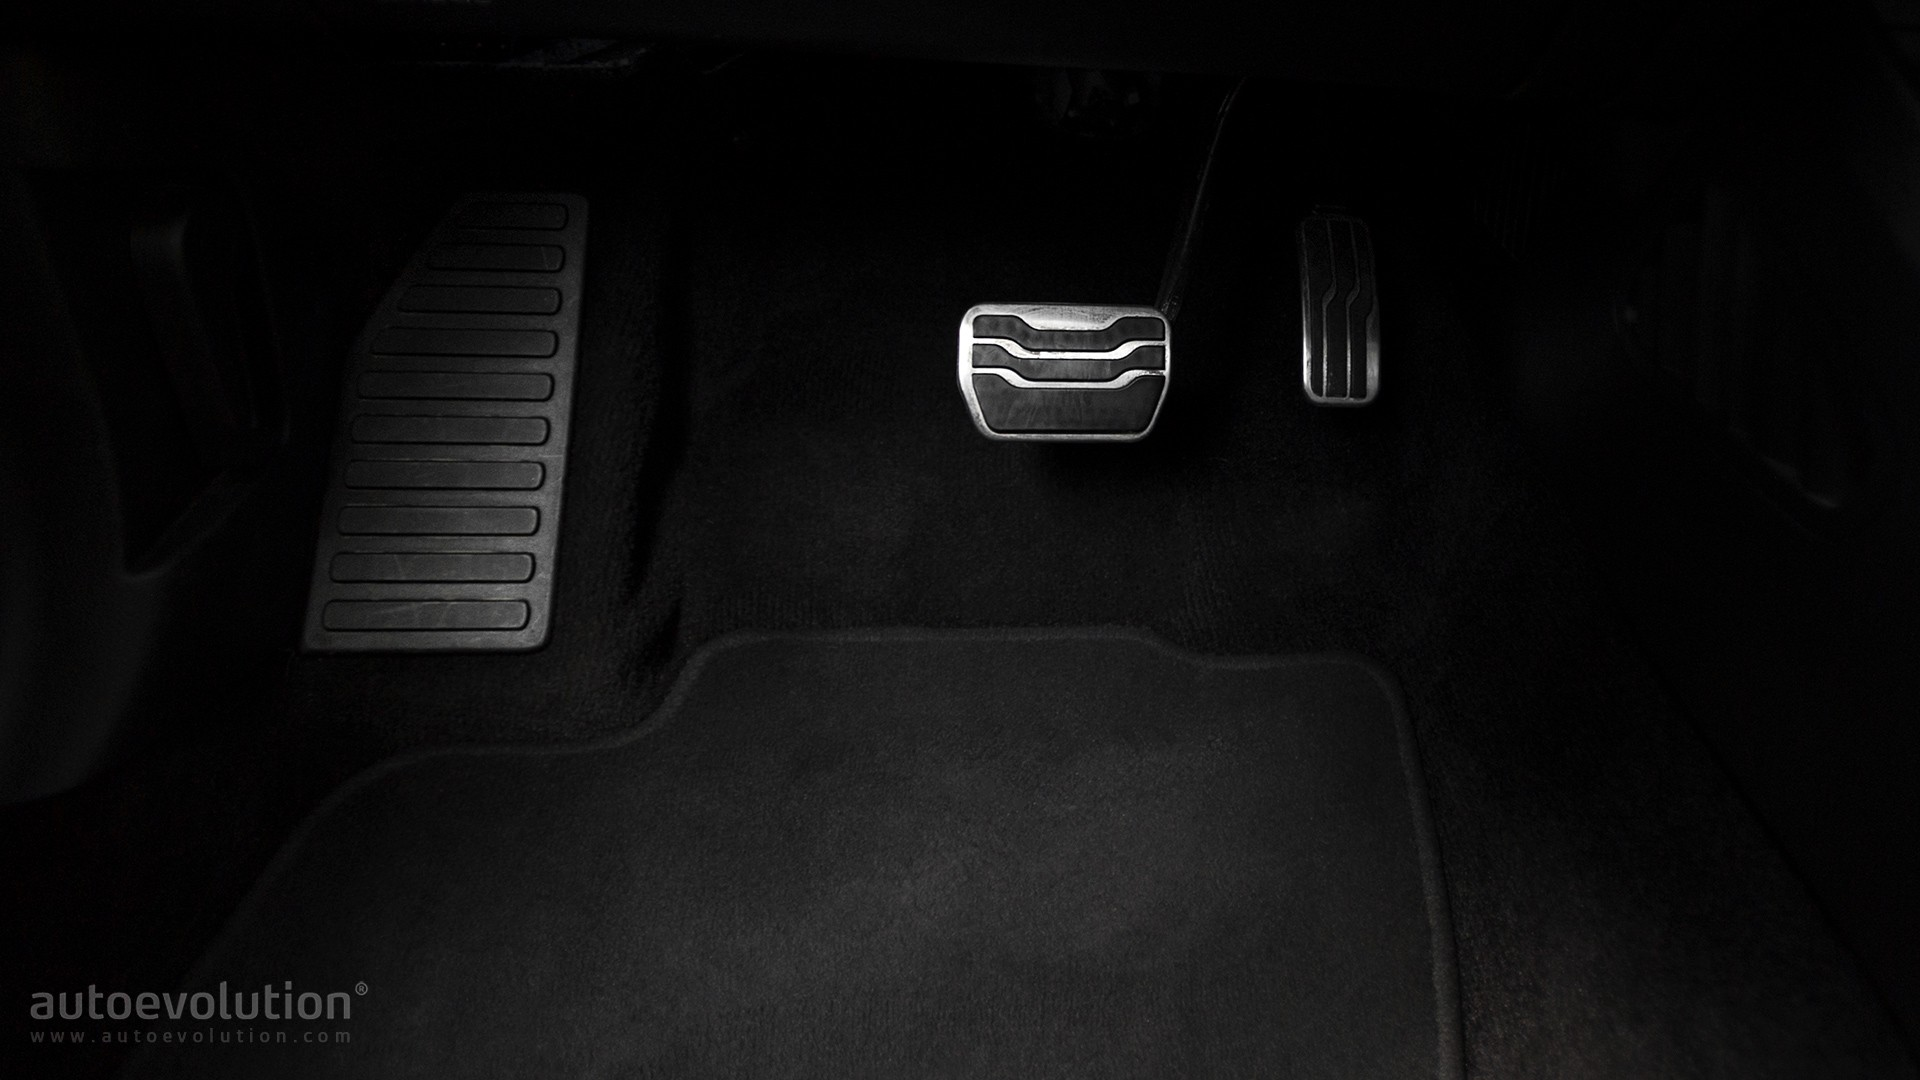 2017 ford edge manual pdf